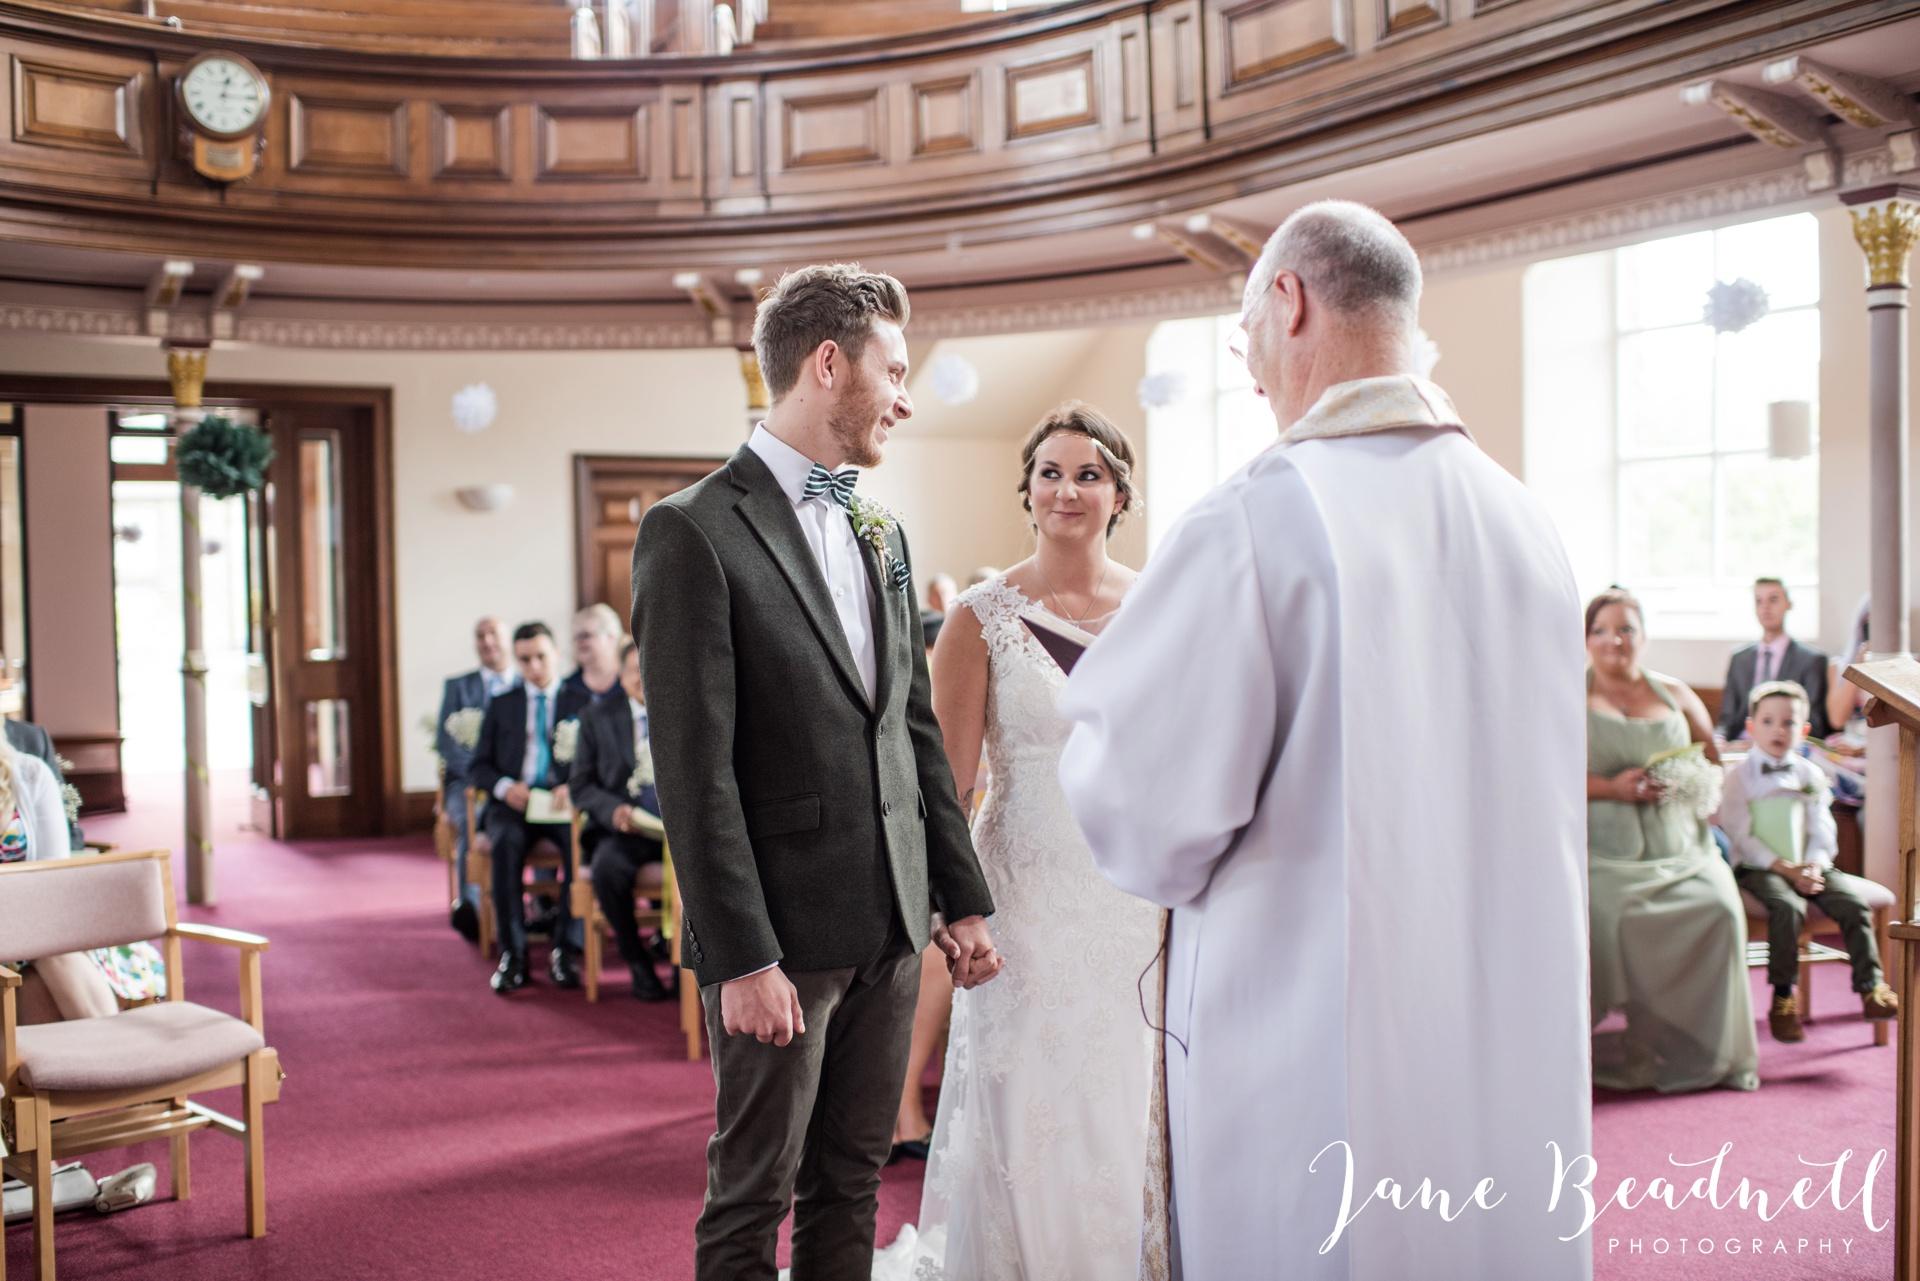 Jane Beadnell fine art wedding photographer The Old Deanery Ripon_0031